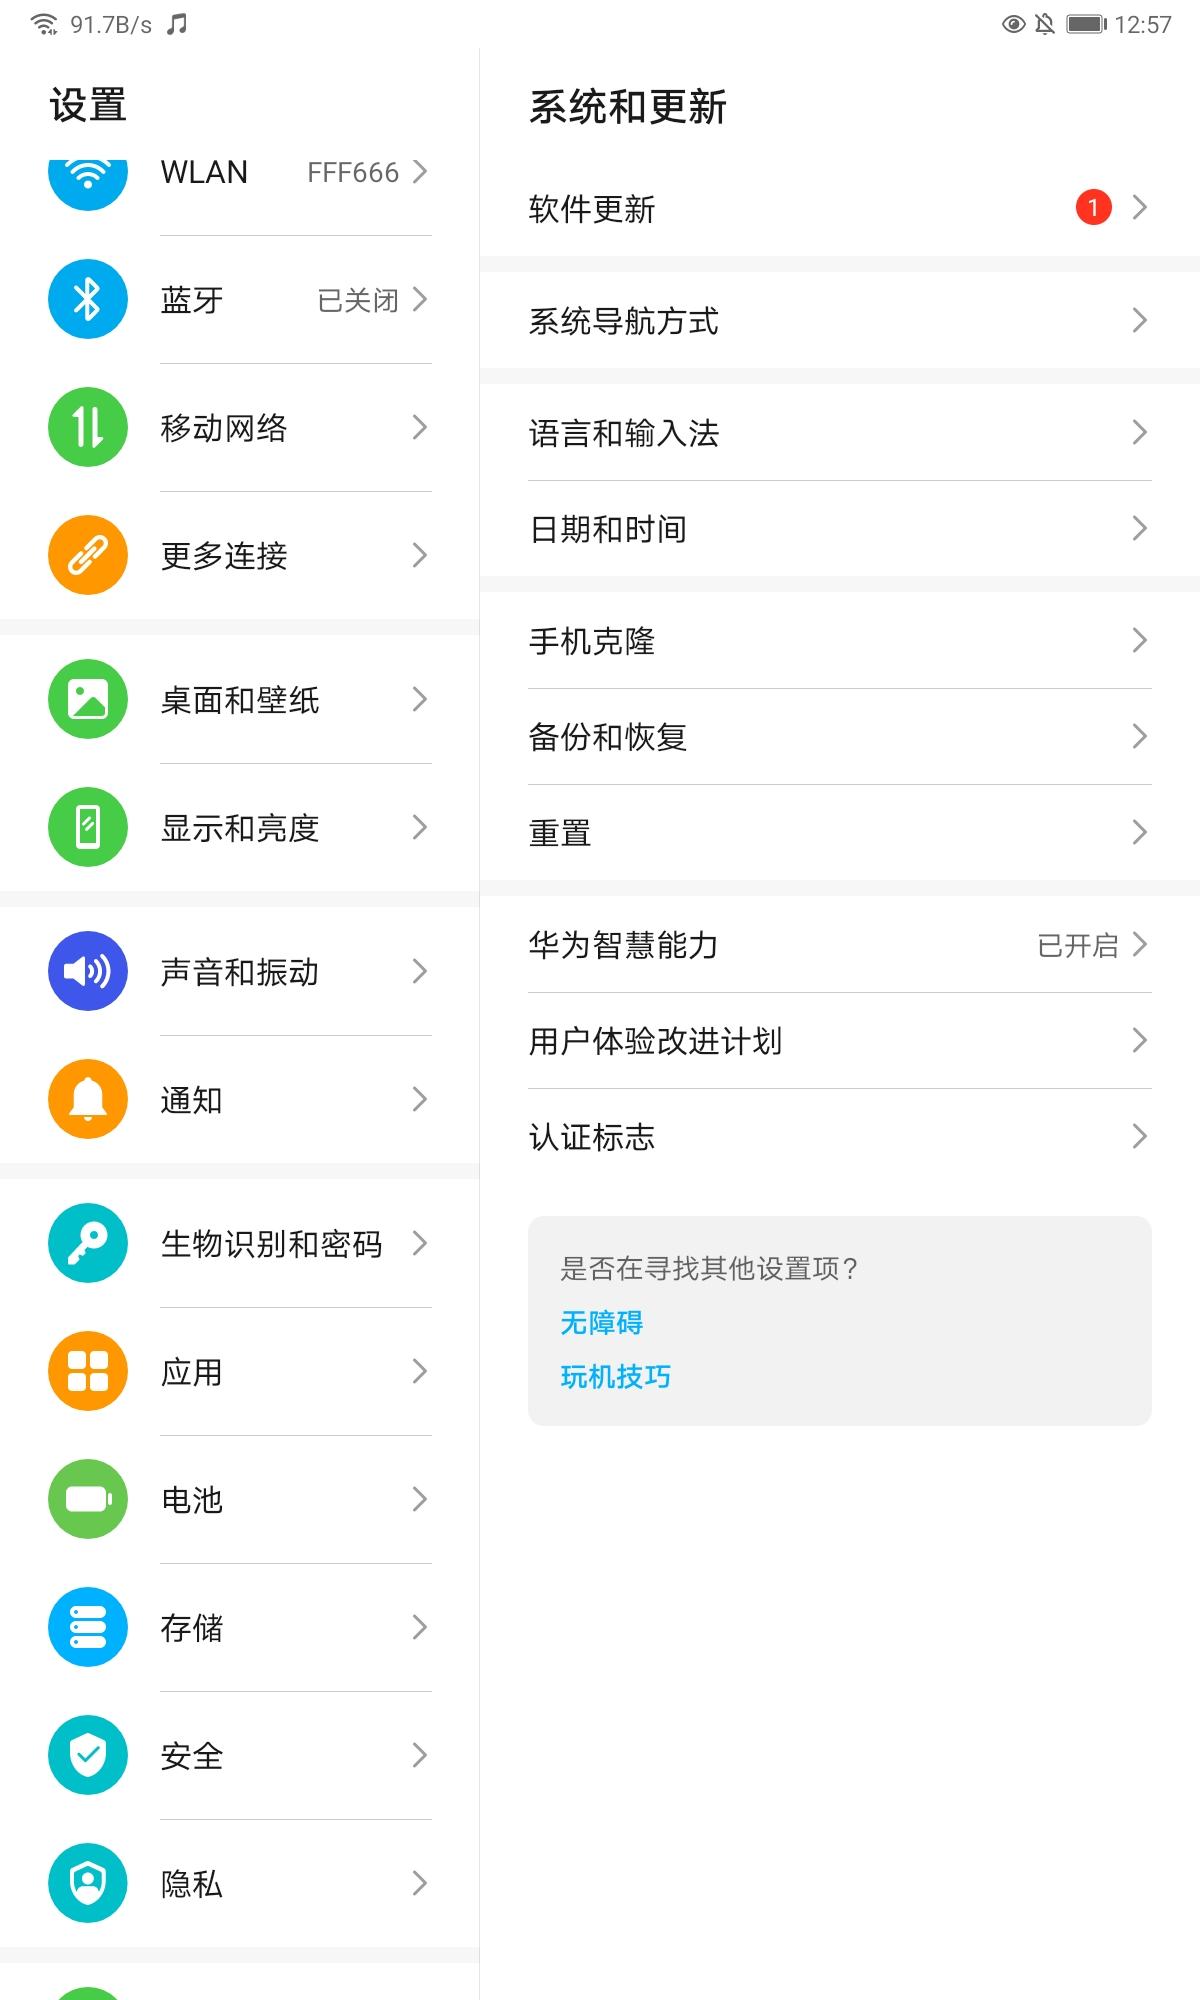 Screenshot_20201026_125757_com.android.settings.jpg